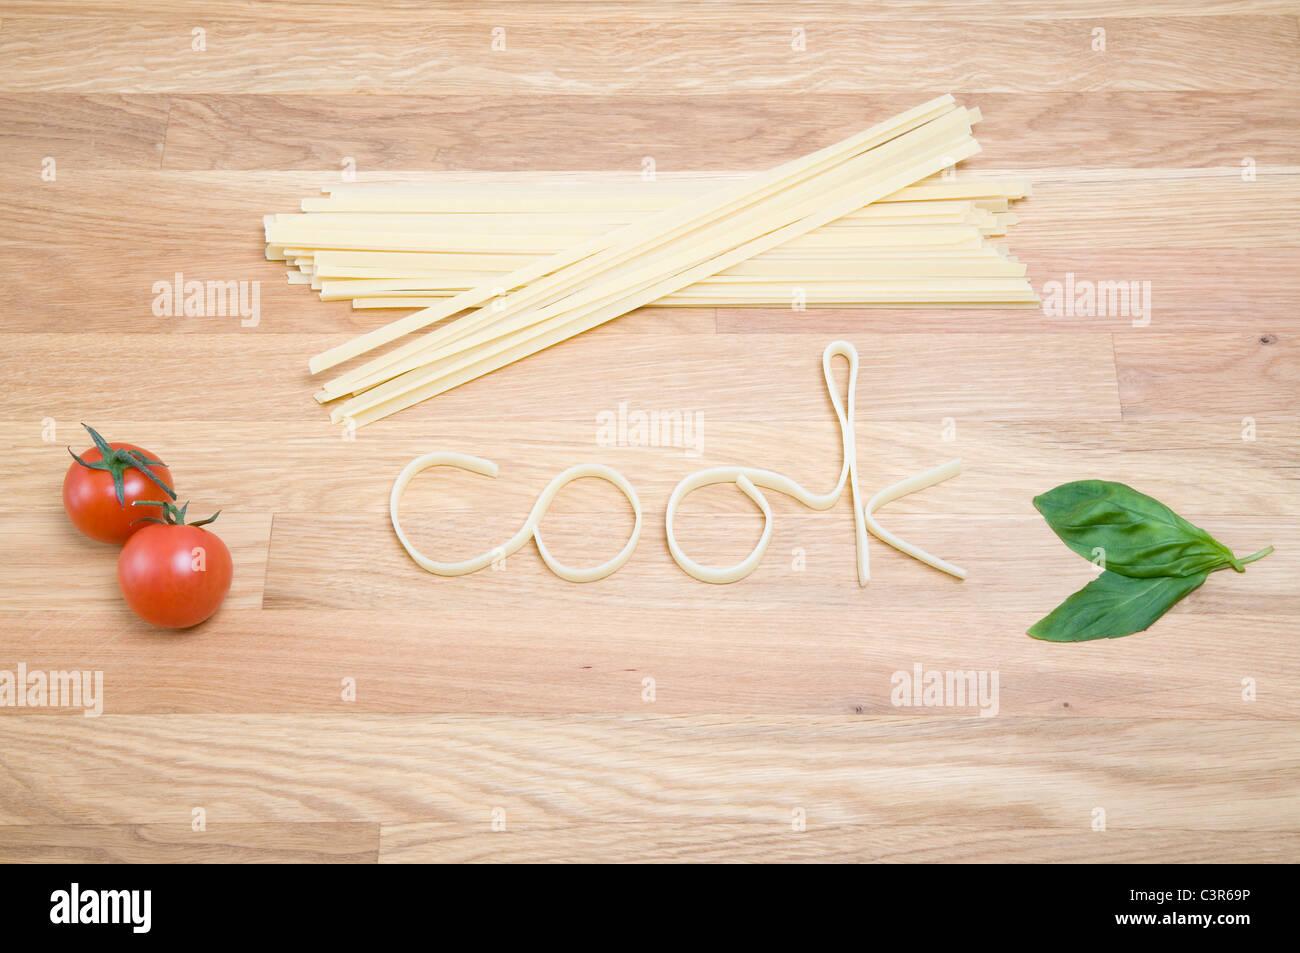 Nudeln buchstabieren des Wort-Kochs Stockbild